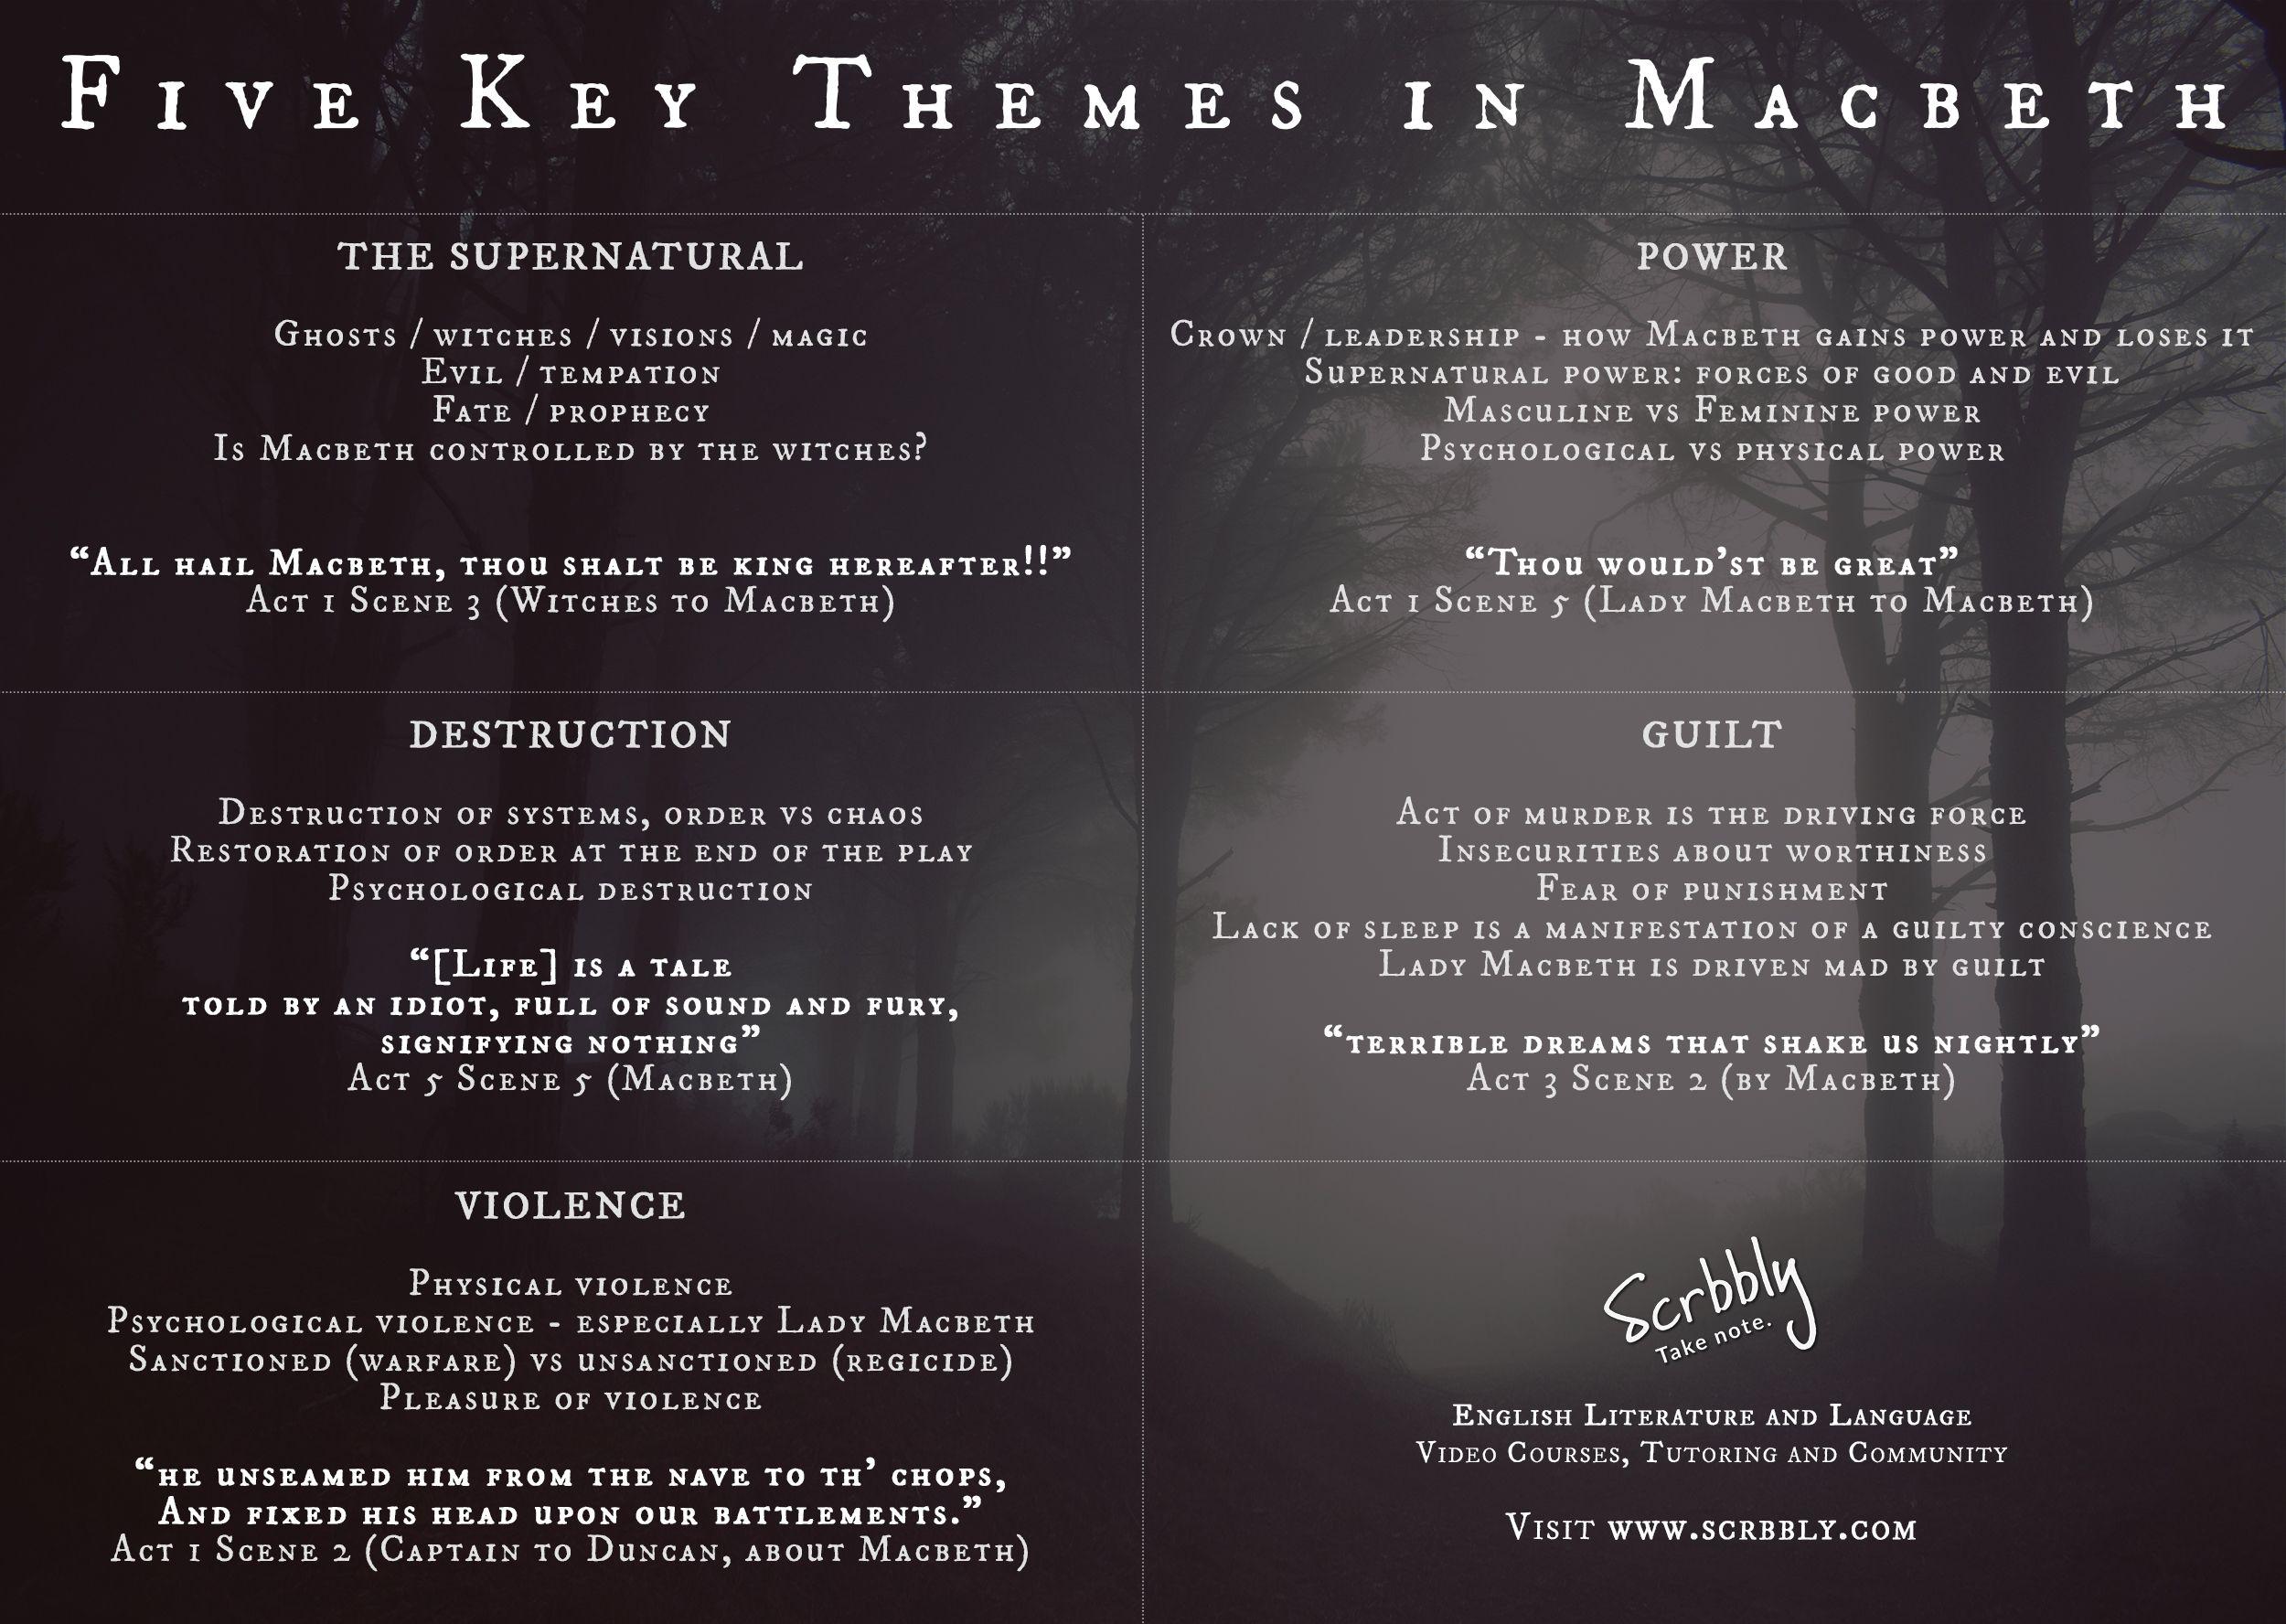 006 5 Key Themes in Shakespeare's Macbeth Power, Destruction